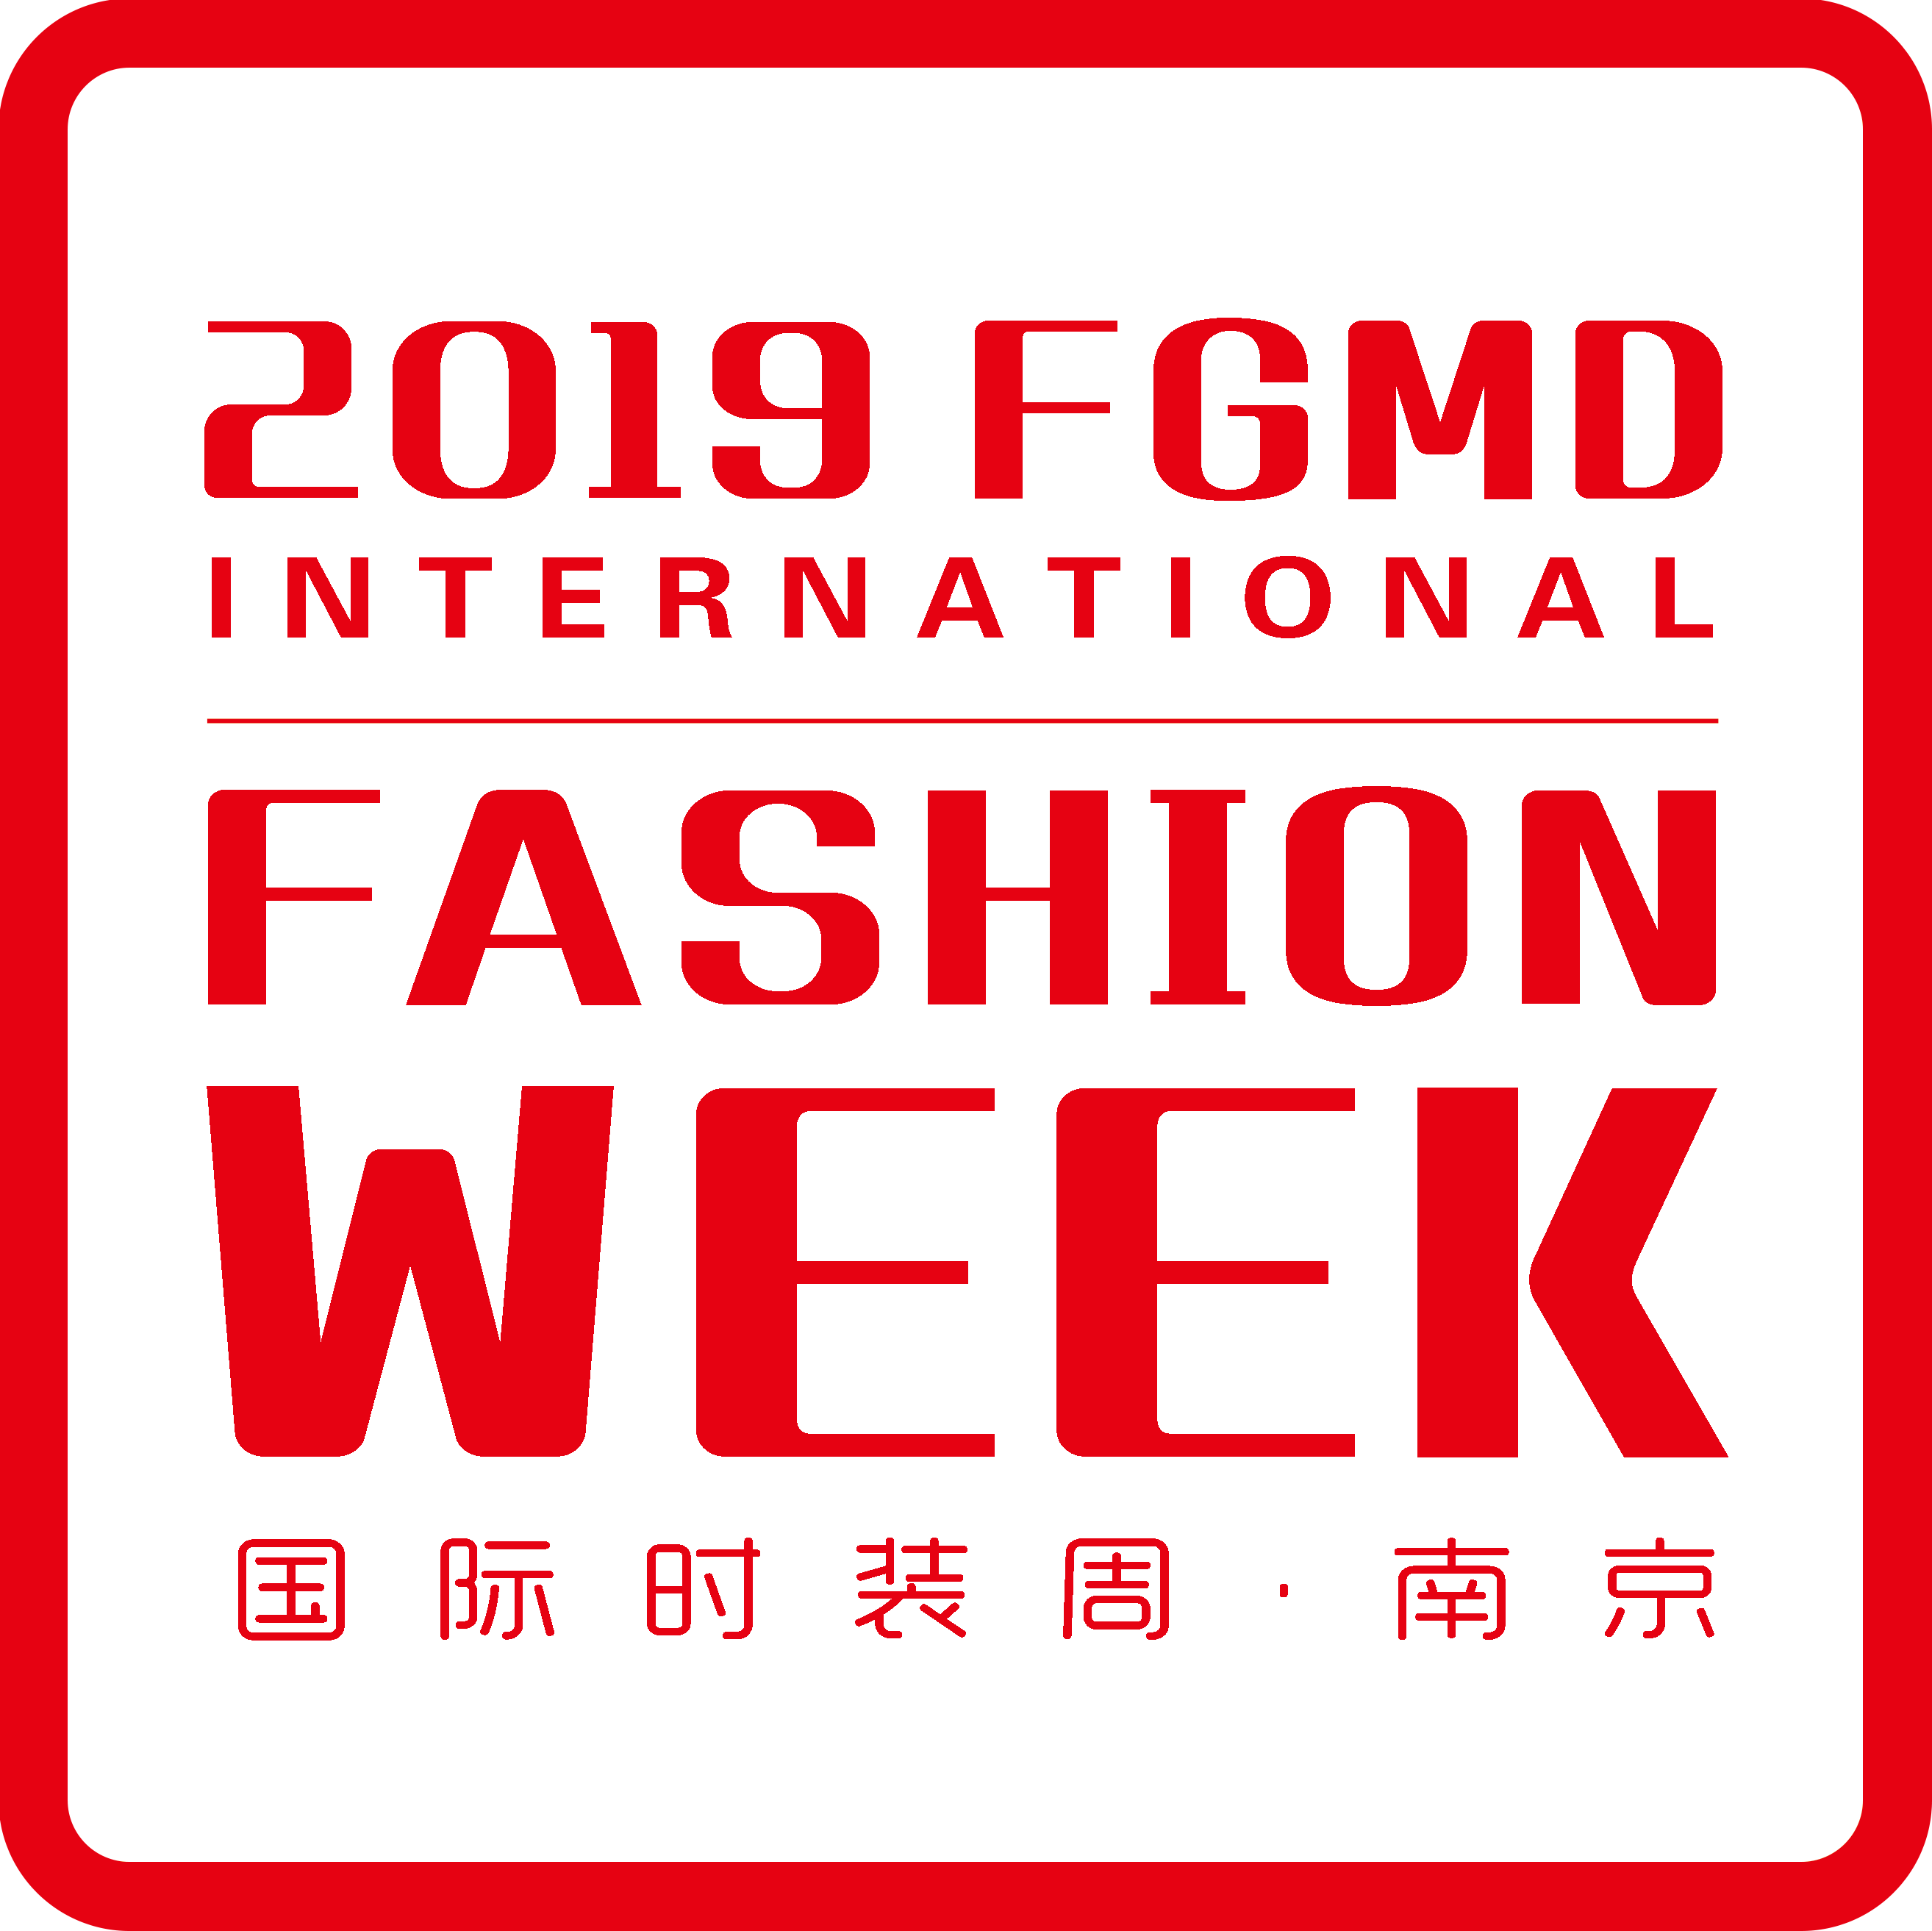 FGMD南京国际时尚周——概况